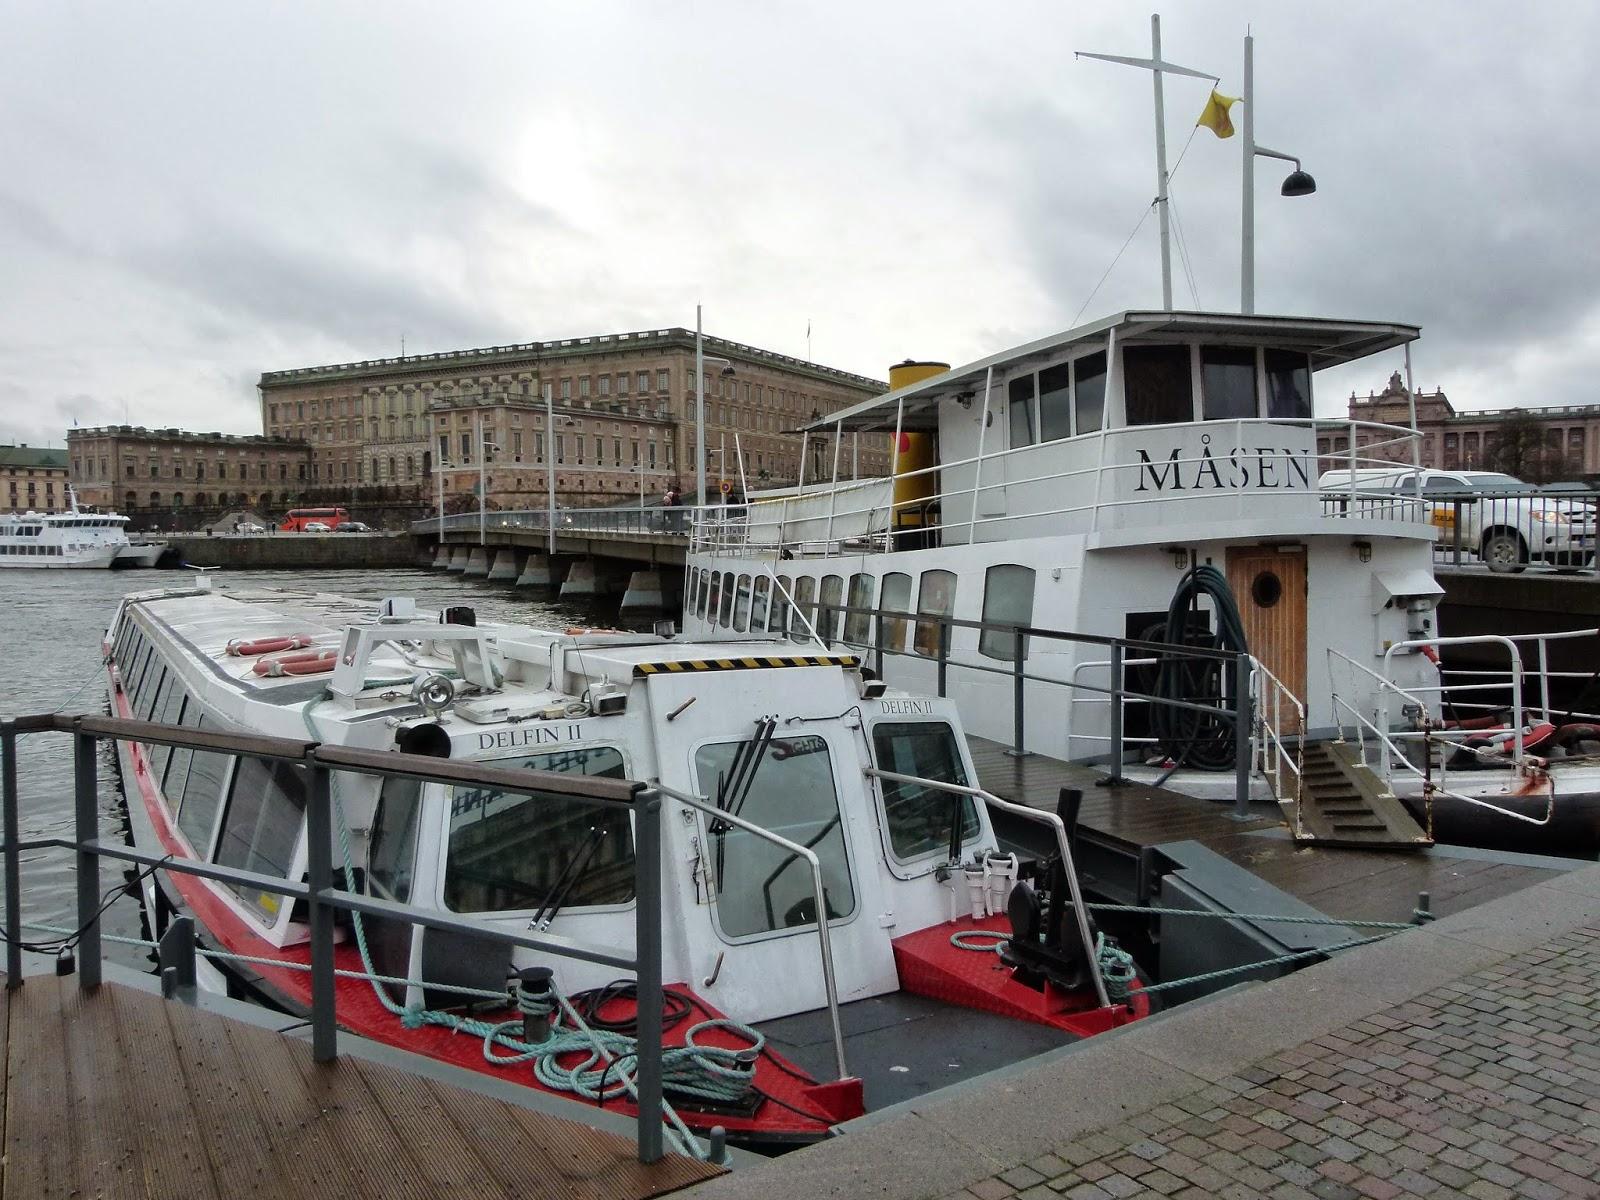 strömma boat tour stockholm